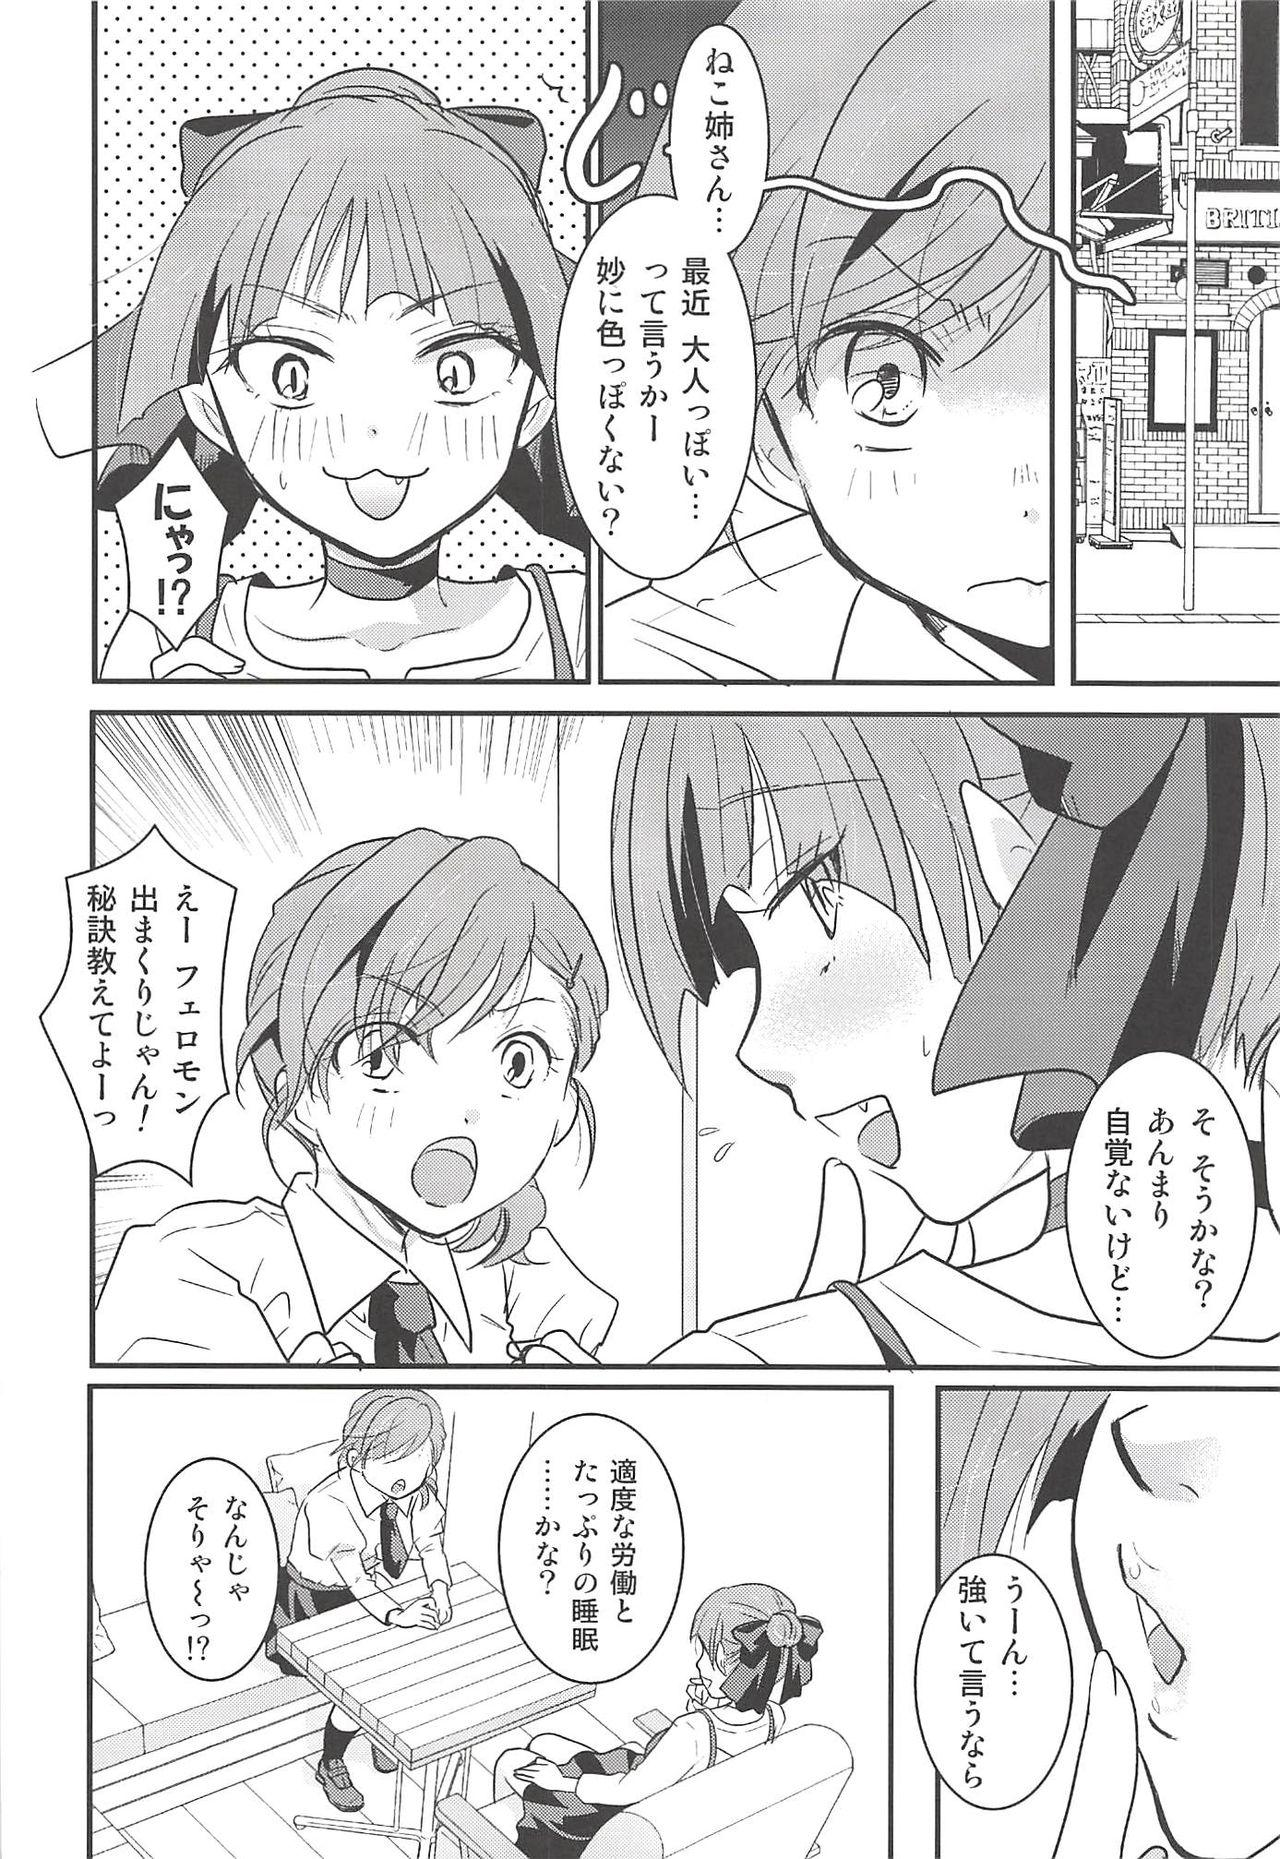 Neko Musume Suikan 36